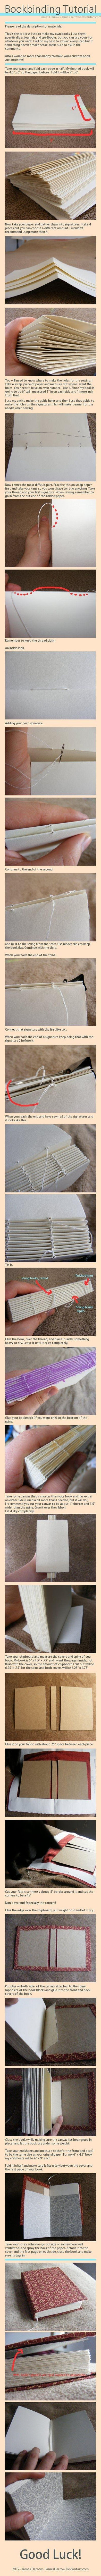 Tutorial on book binding..